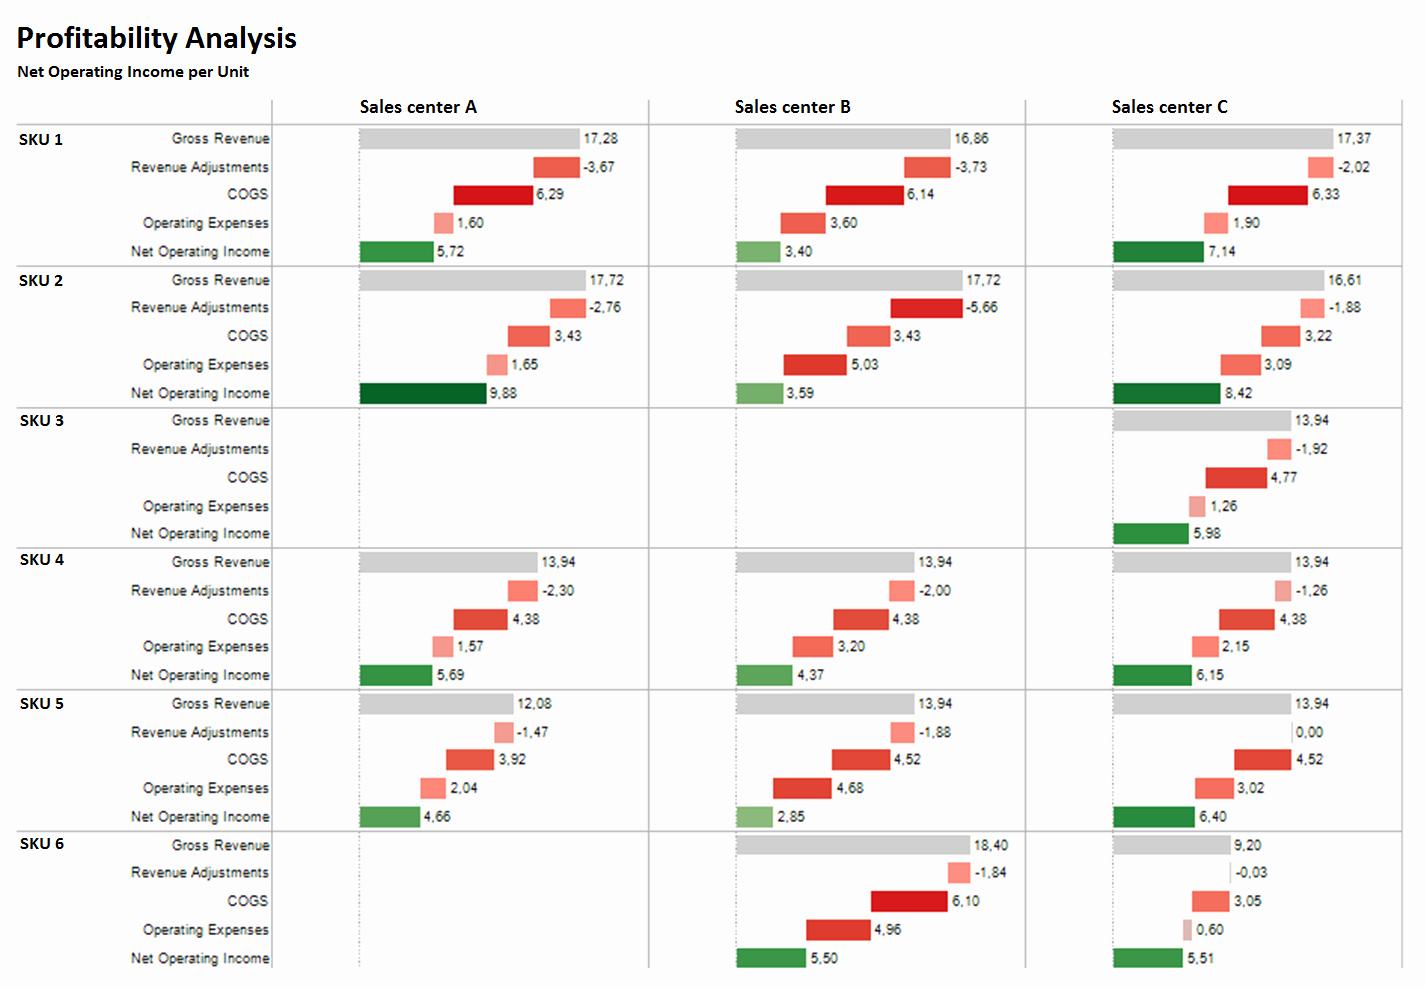 Profitability Analysis Template Best Of Profitability Analysis Net Operating In E Per Unit